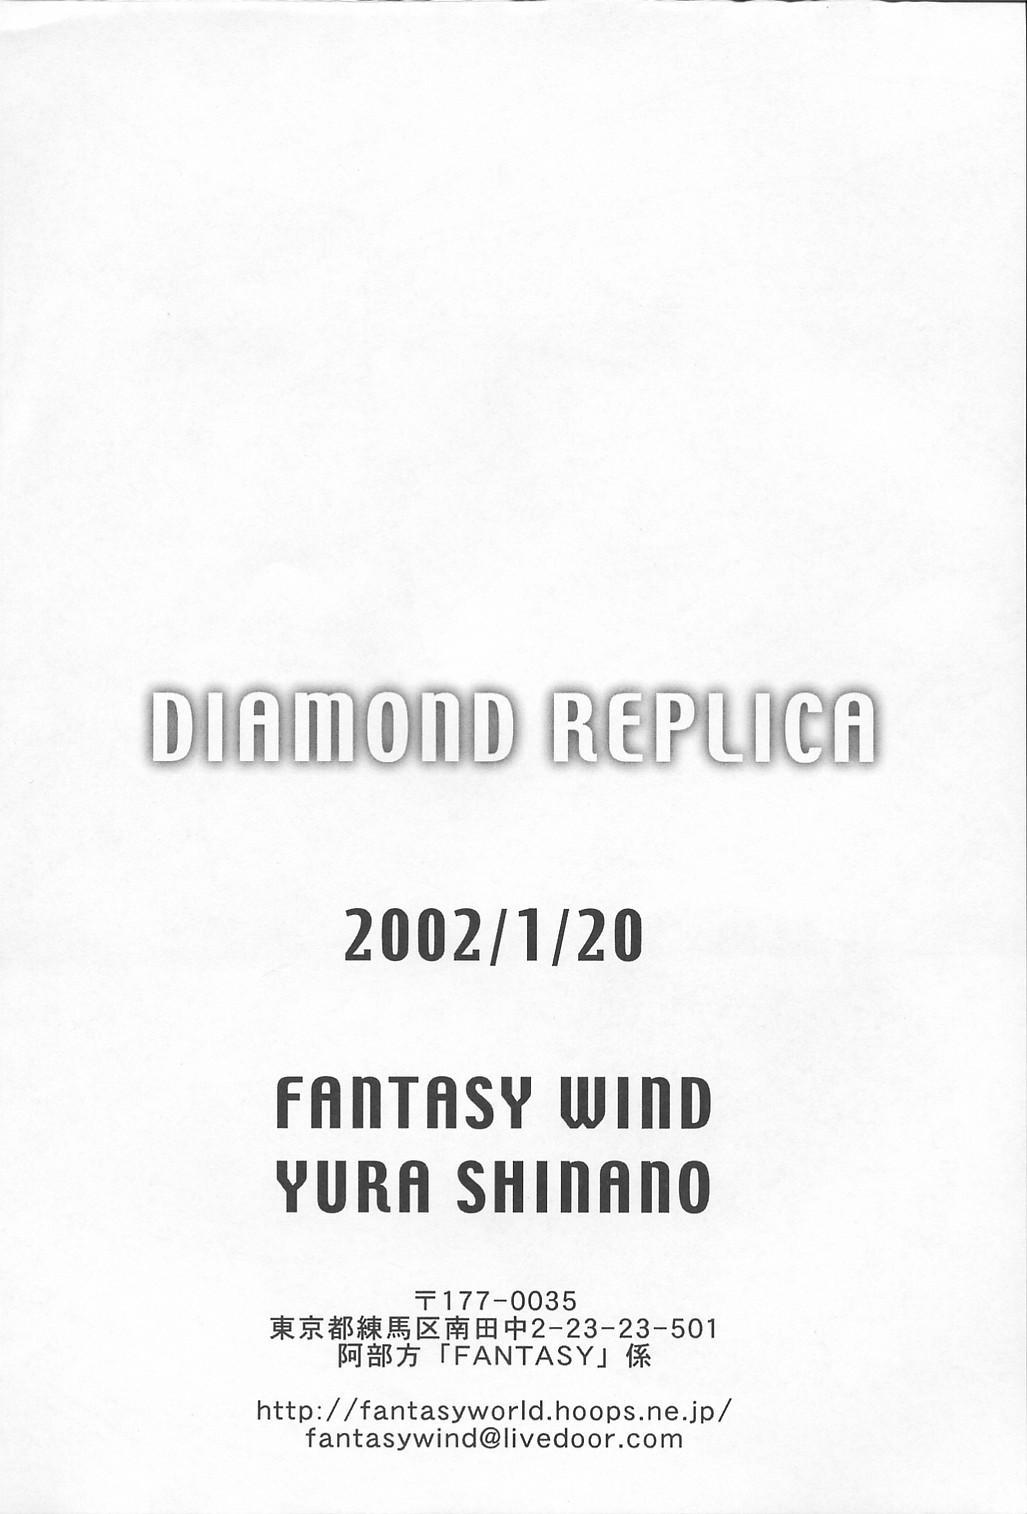 DIAMOND REPLICA 24